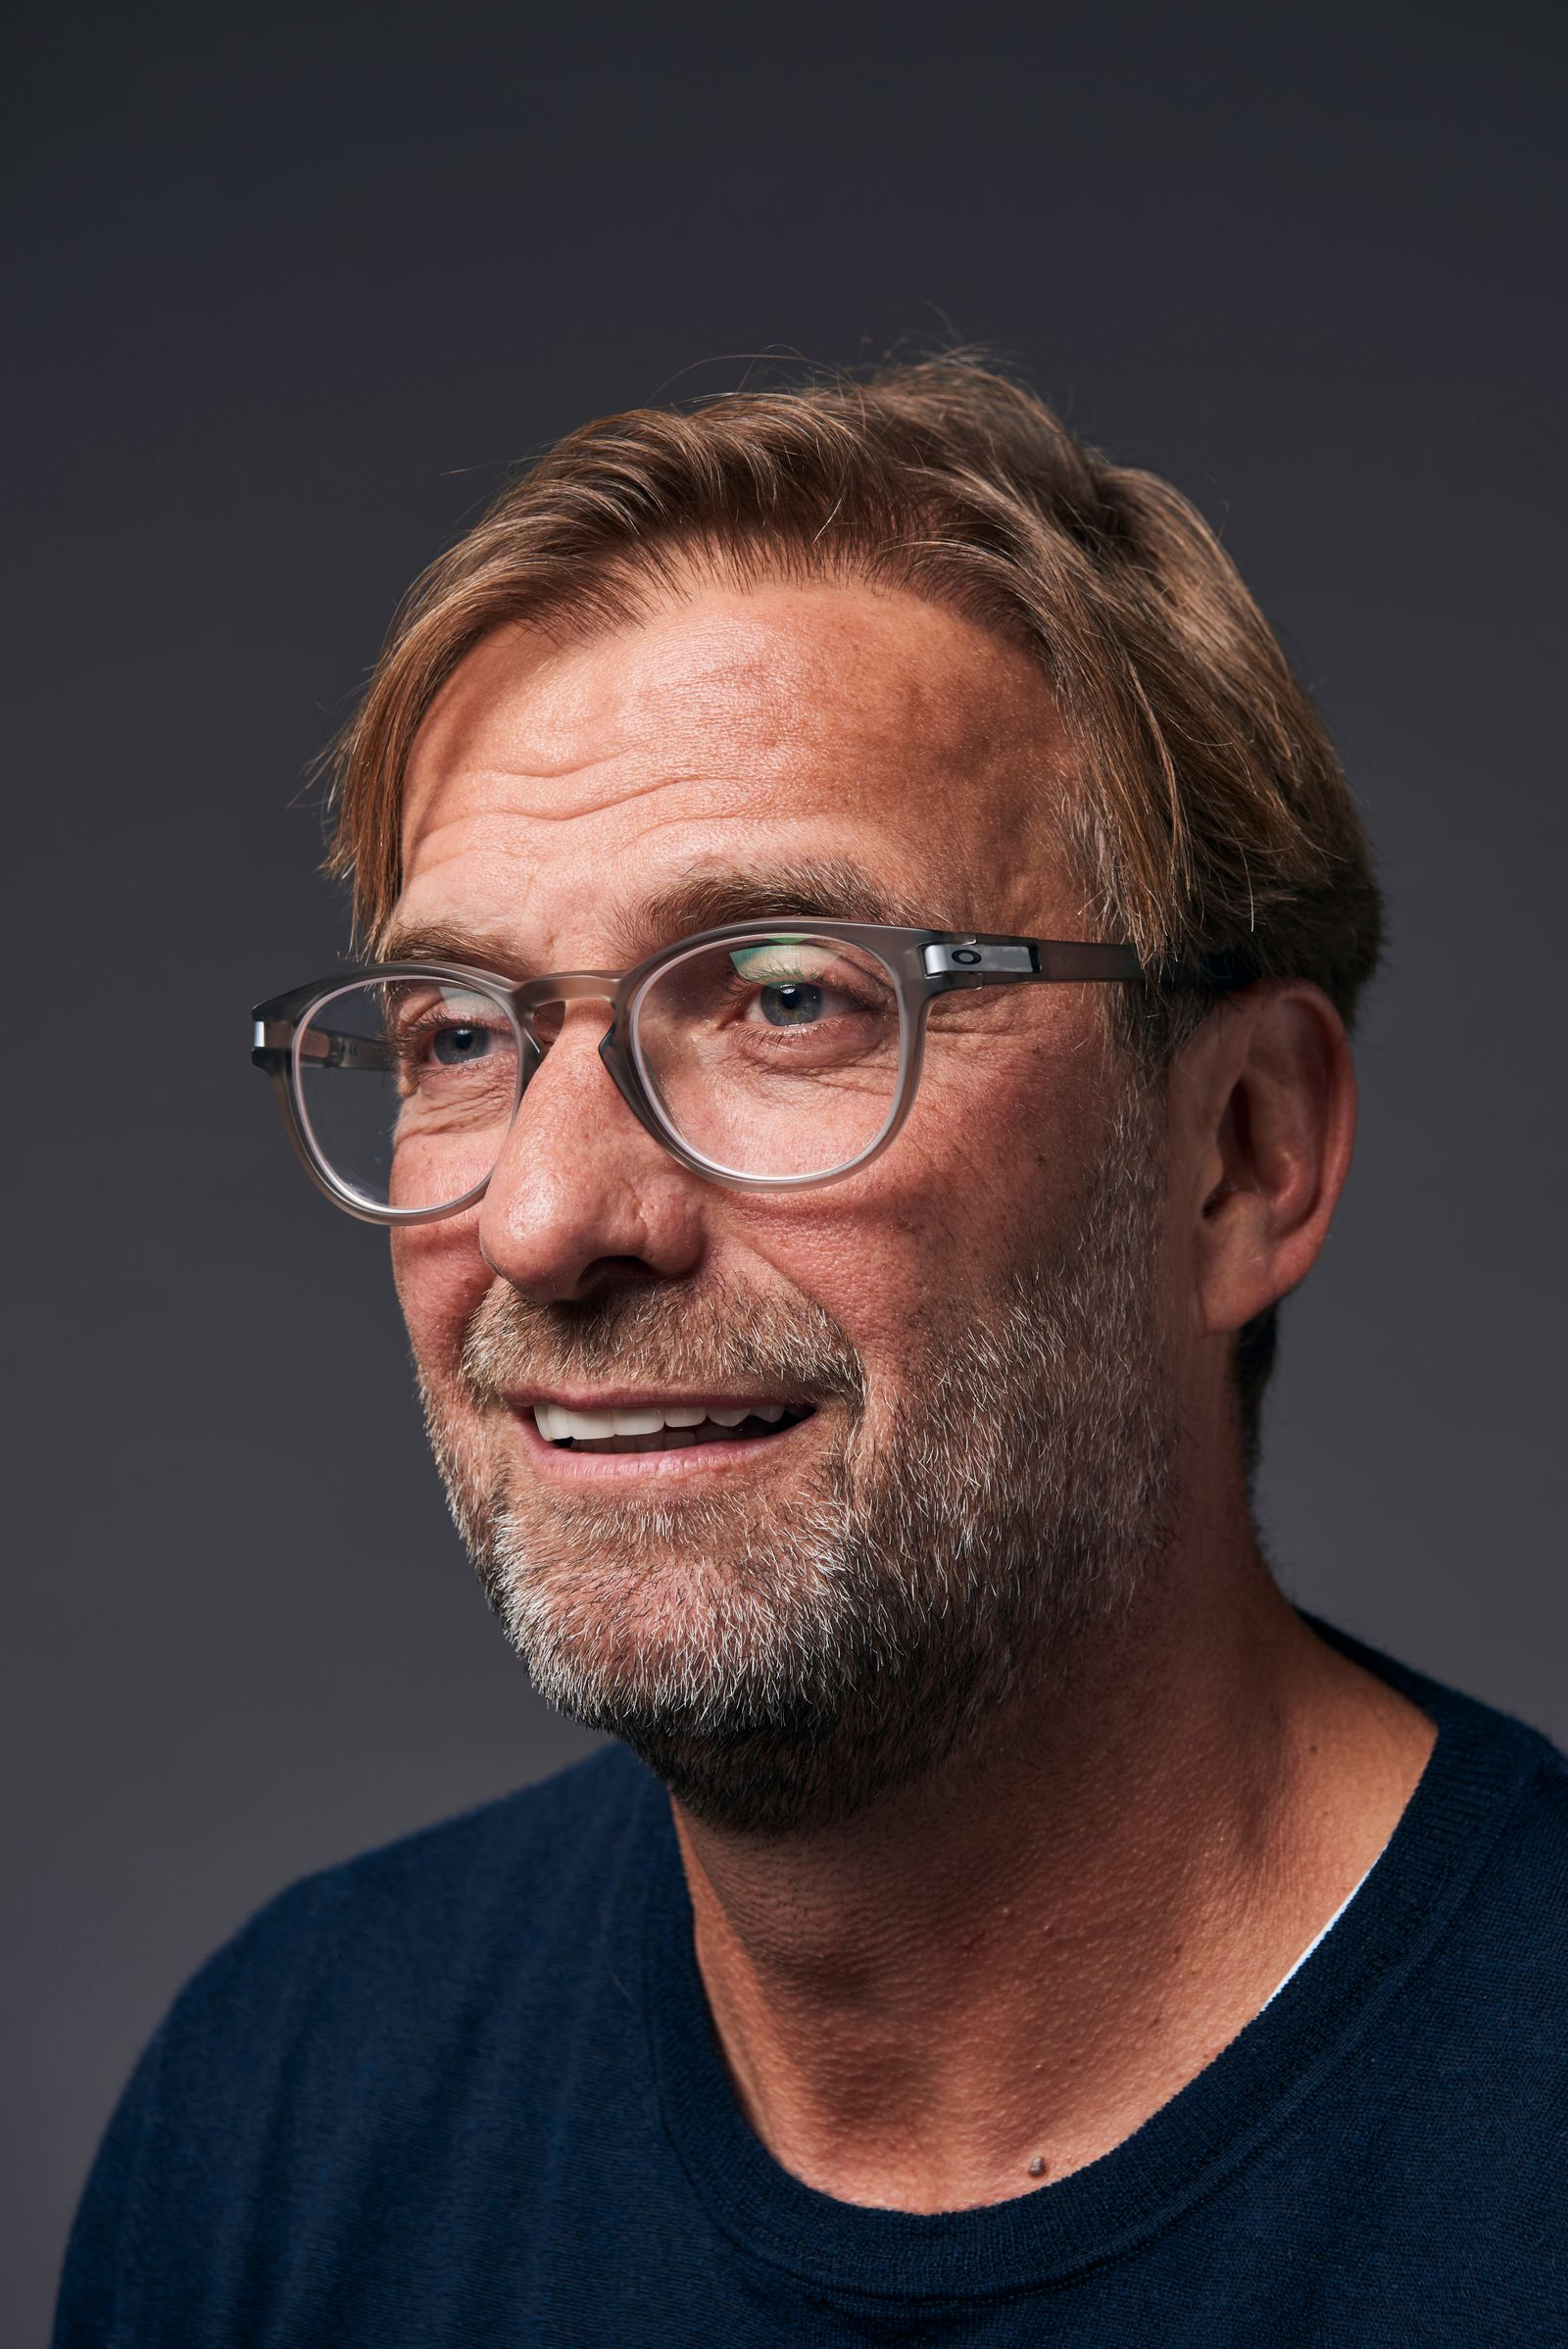 The Best FIFA Football Awards 2019 - Portraits